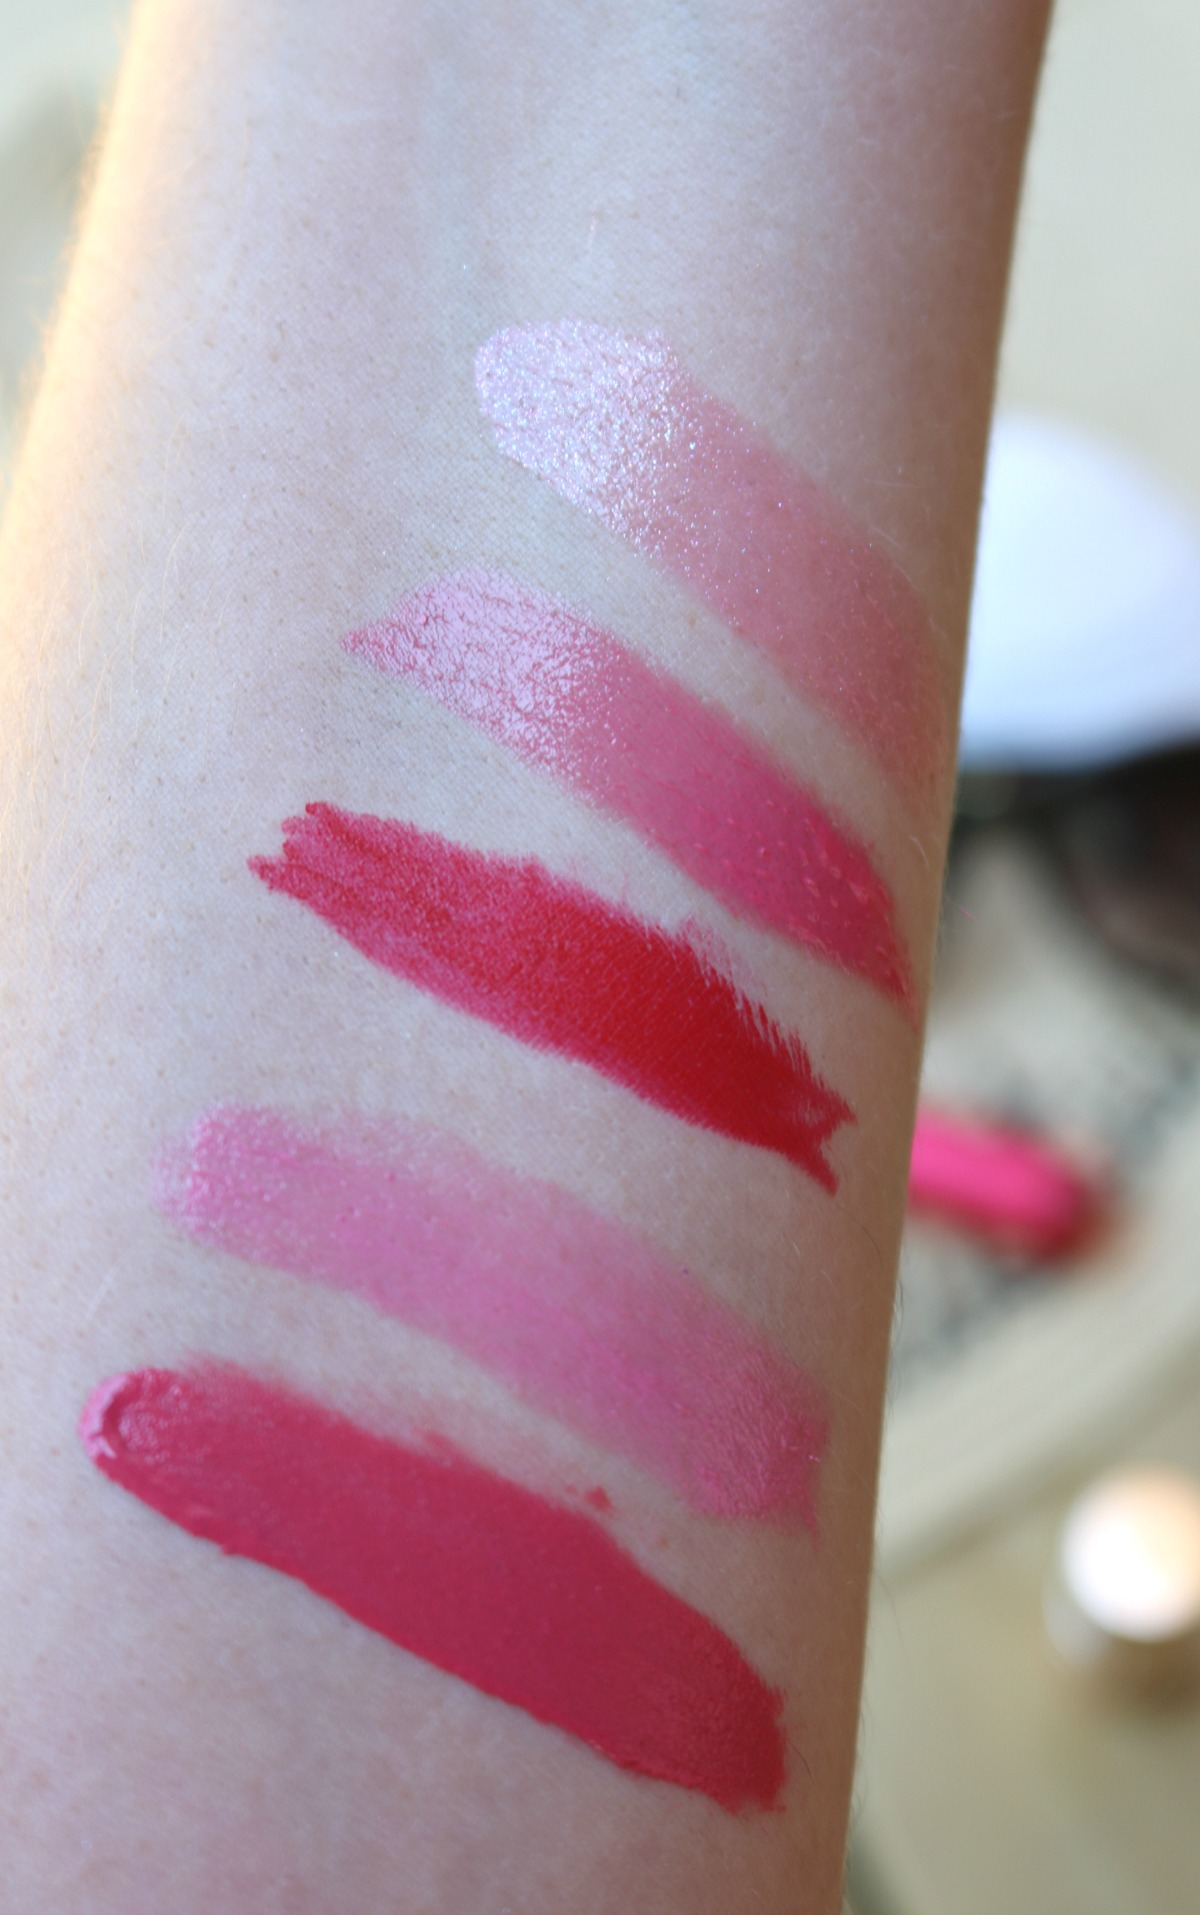 Favorite Summer Lipsticks I DreaminLace.com #SummerMakeup #lipstick #drugstoremakeup #luxurymakeup